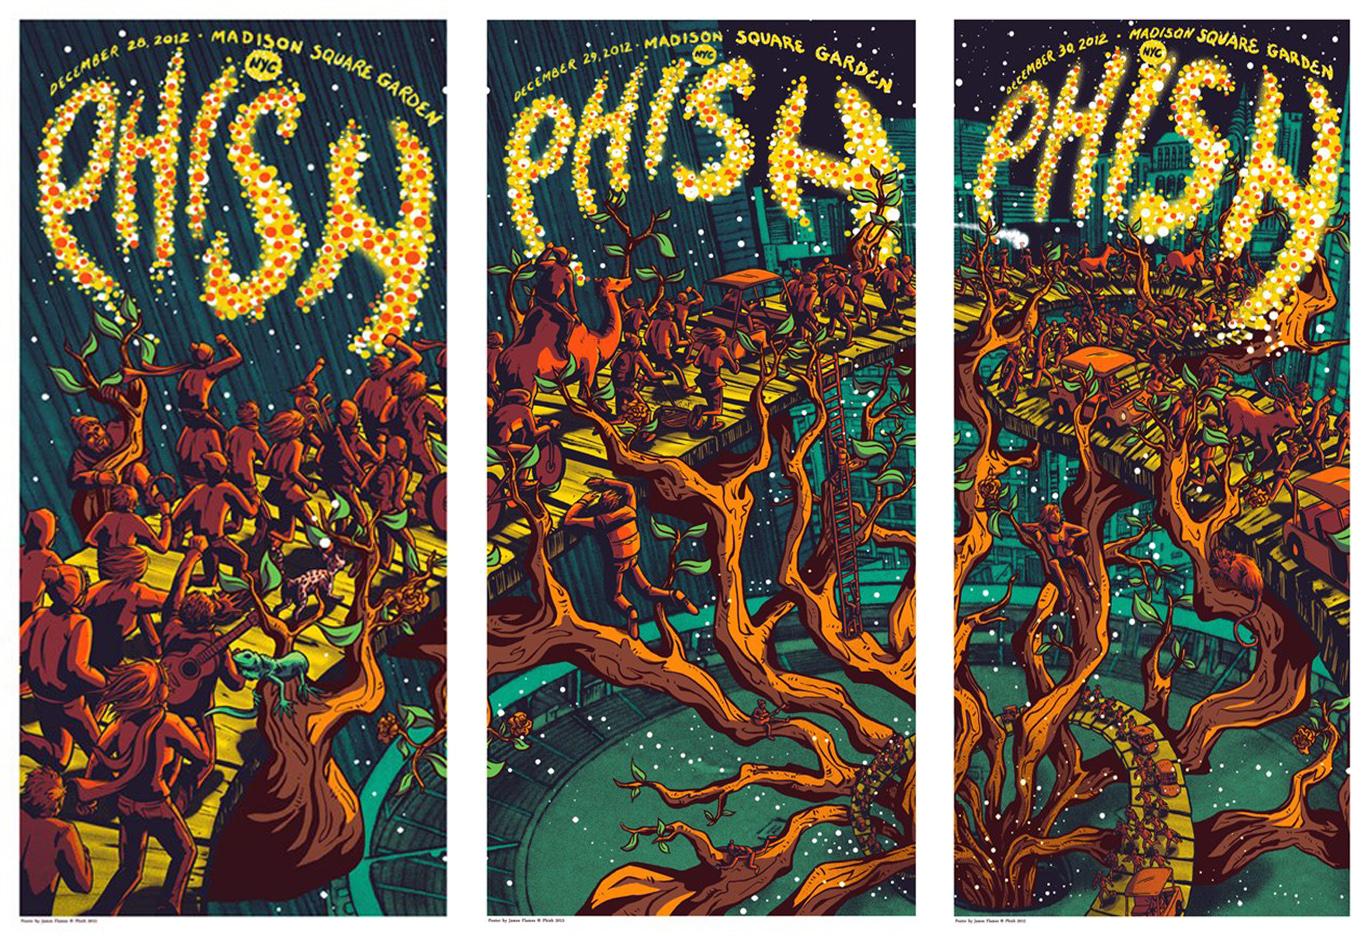 live phish s artwork